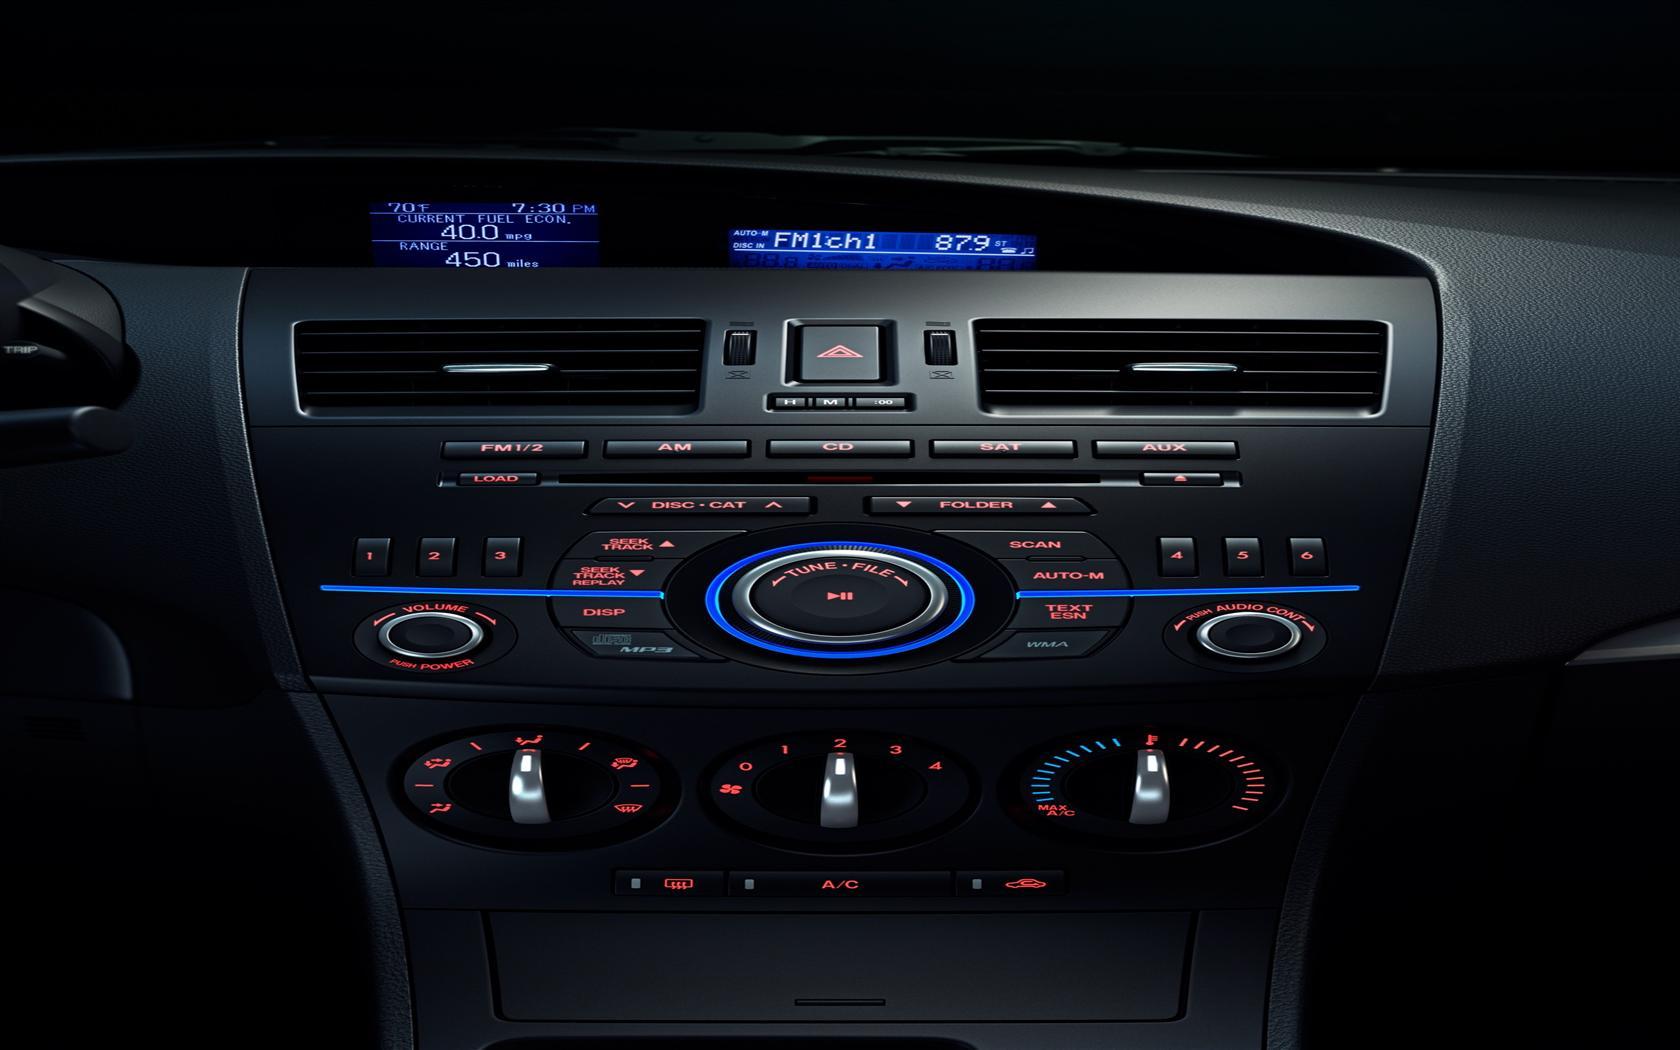 https://www.conceptcarz.com/images/Mazda/2012-Mazda3-Sedan-Image-i01-1680.jpg